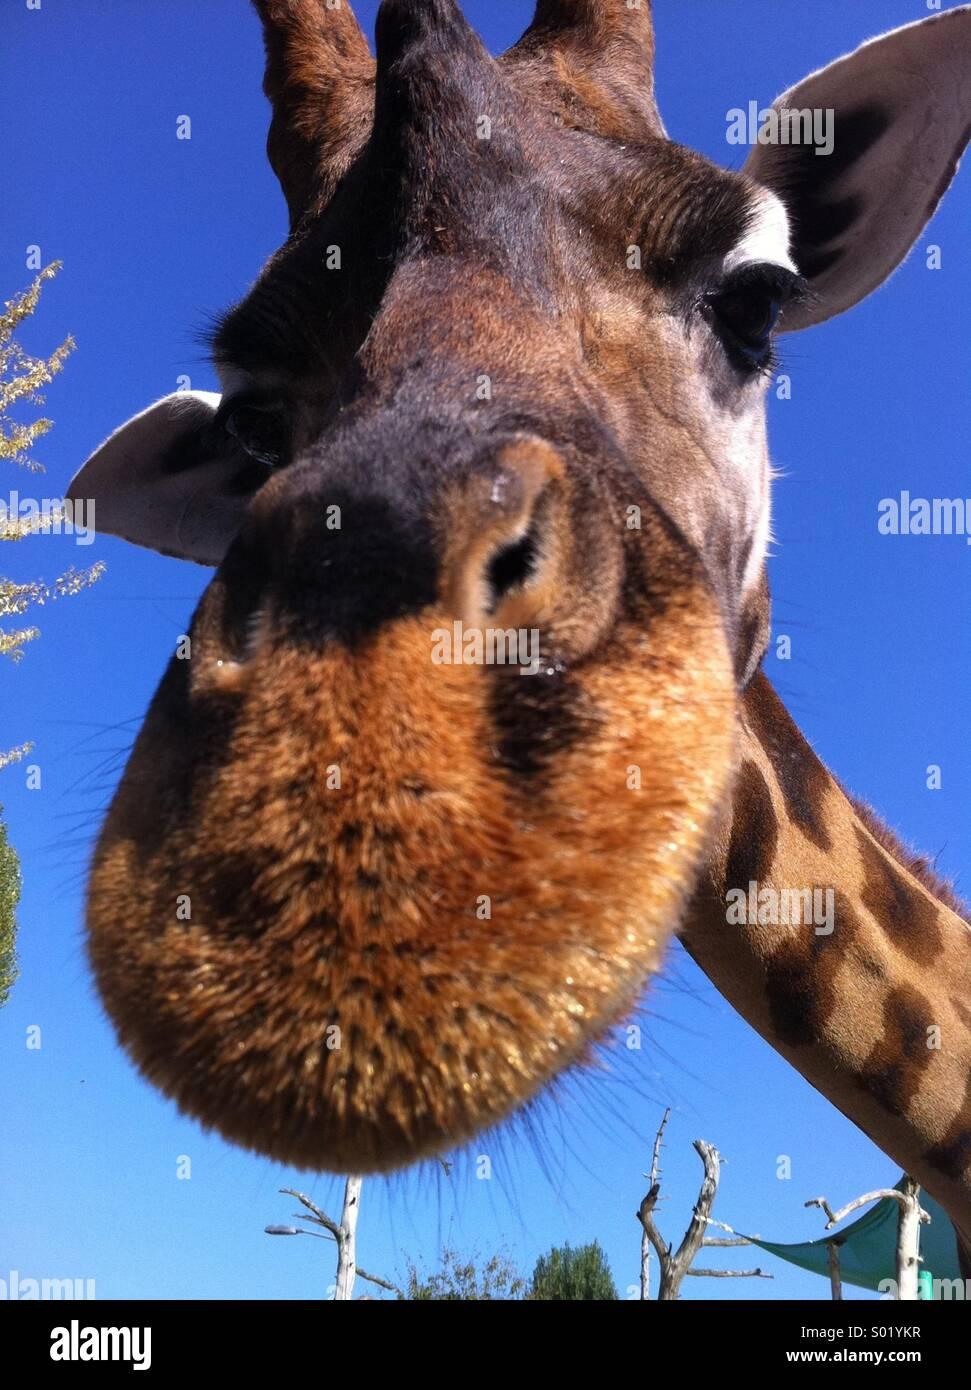 Friendly giraffe - Stock Image